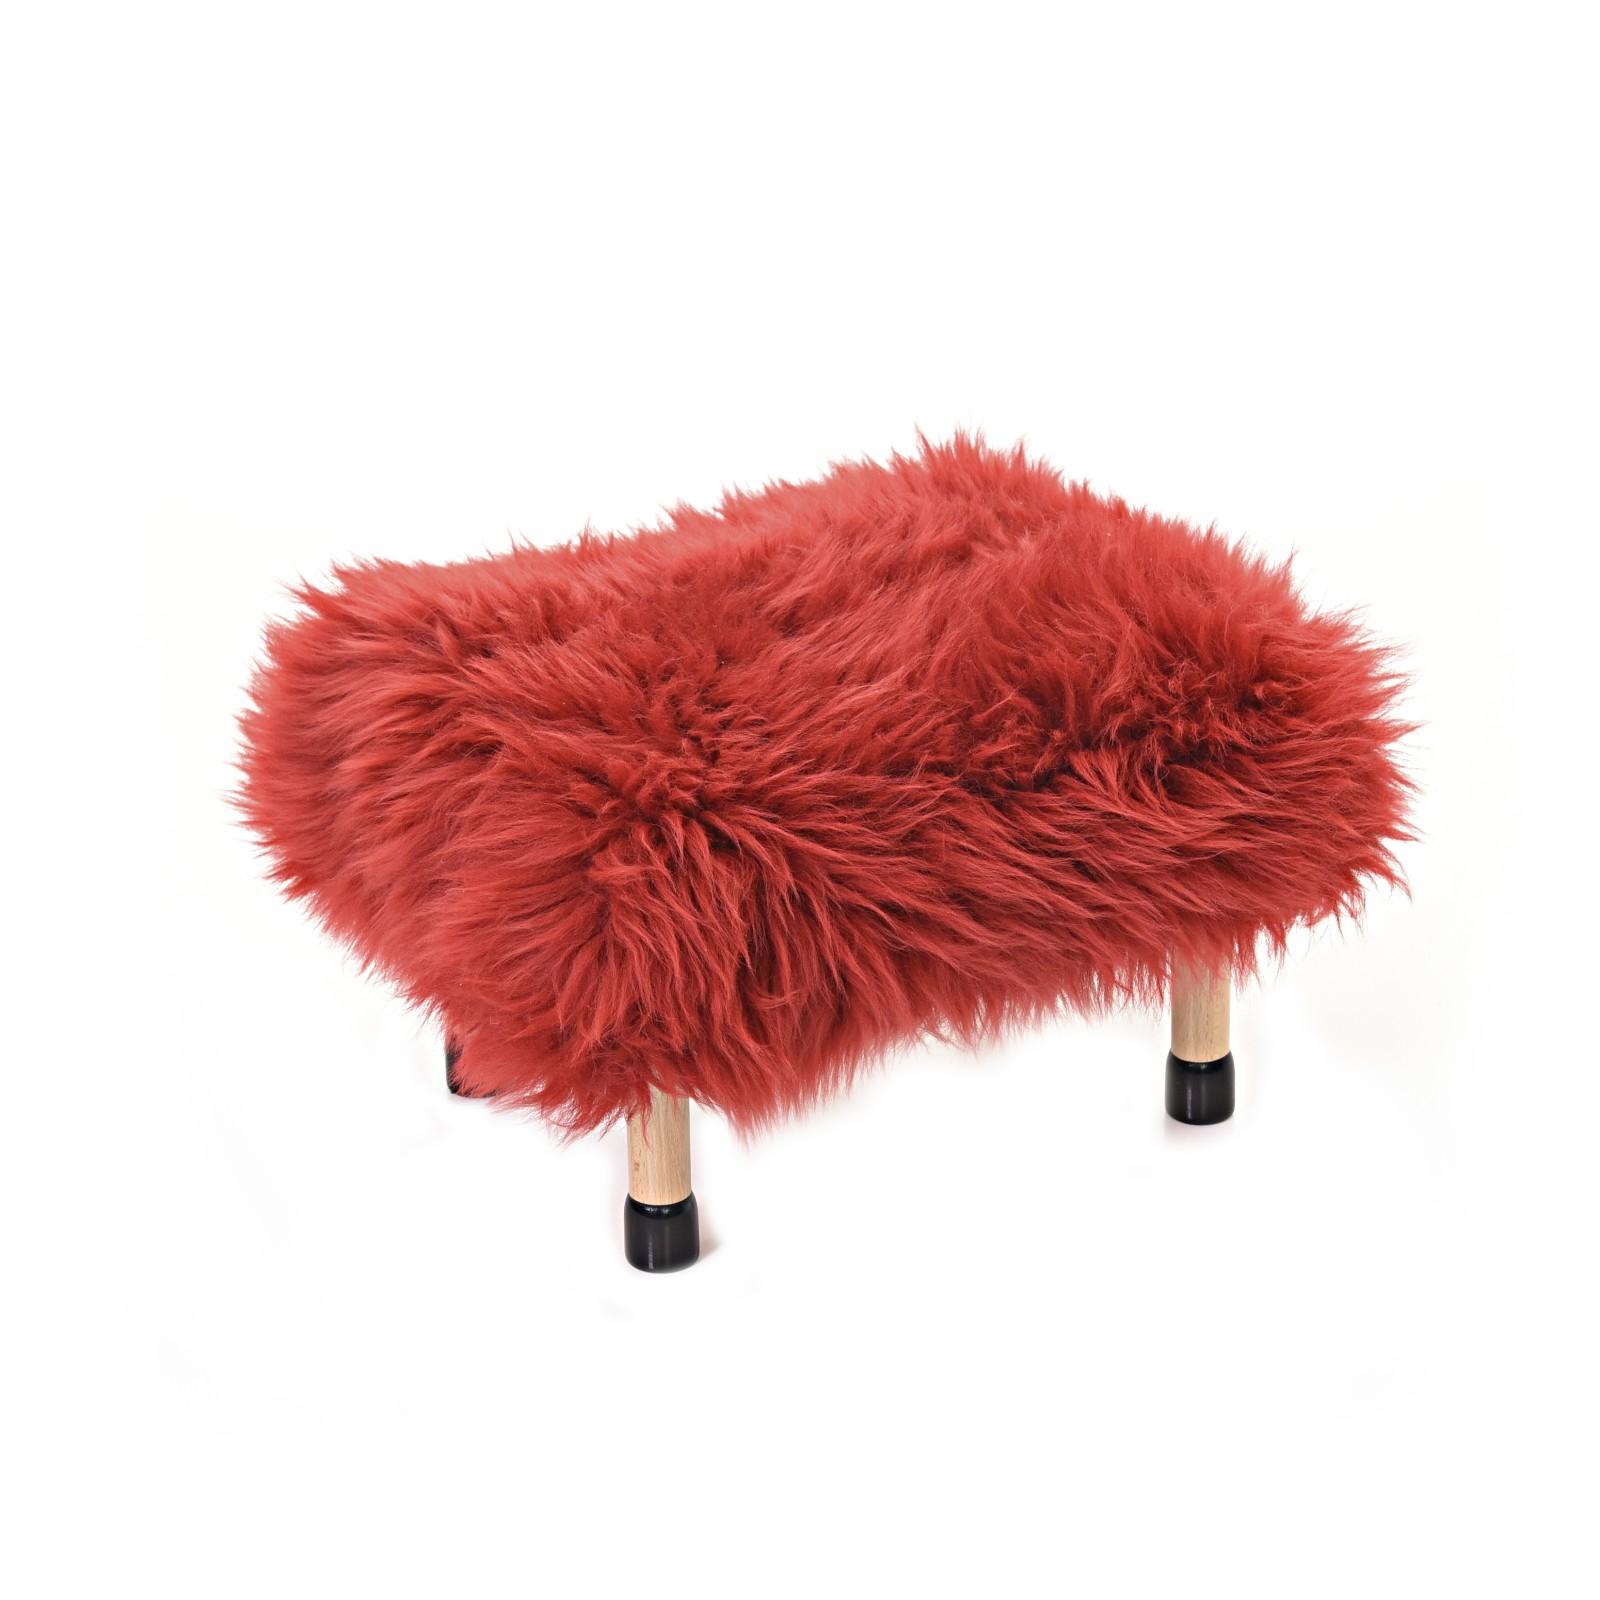 Nia - Sheepskin Footstool Dragon Red